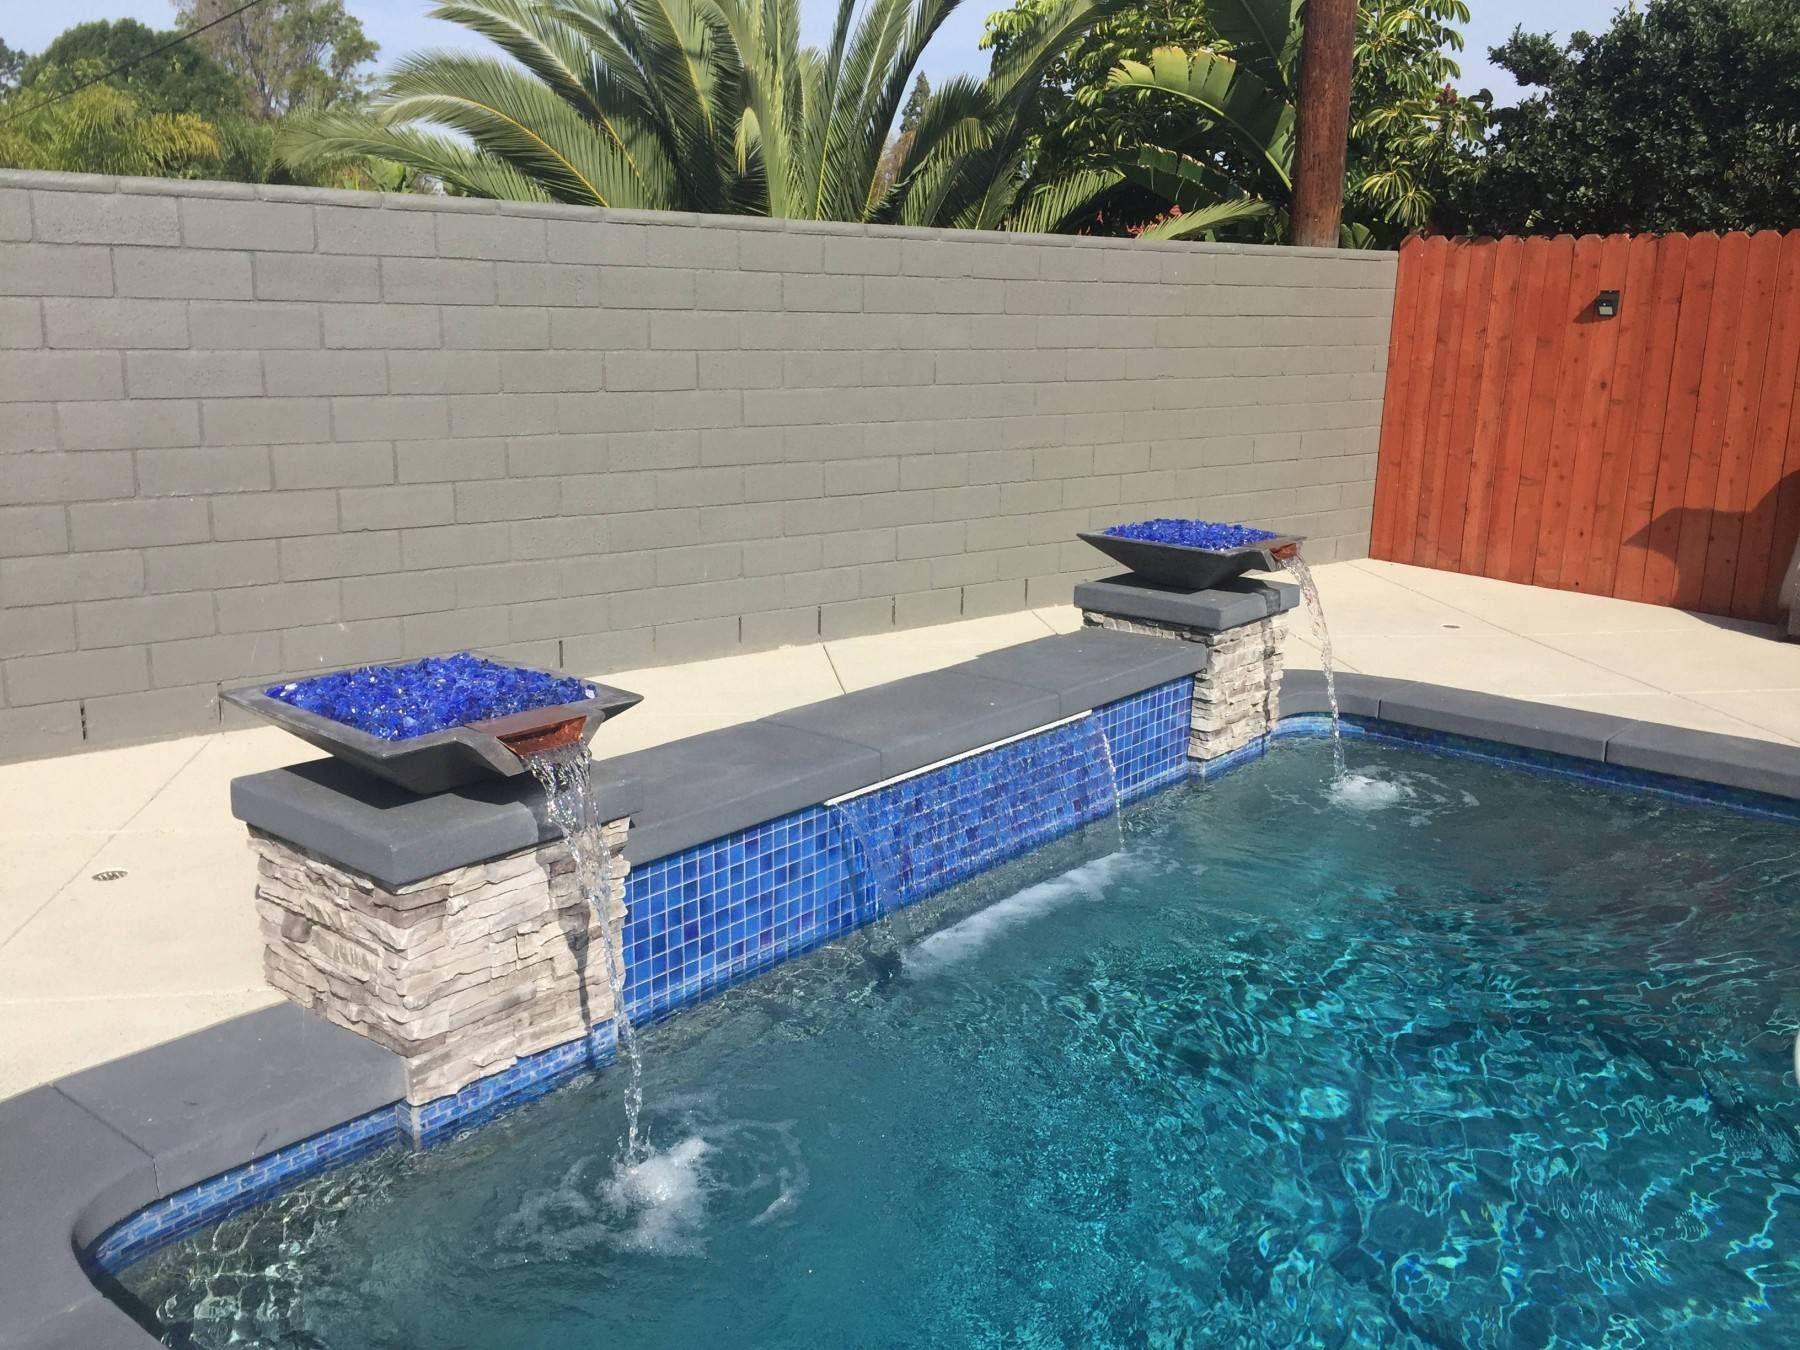 Concrete Pool Fire Bowl Square With Scupper 30 Concrete Pool